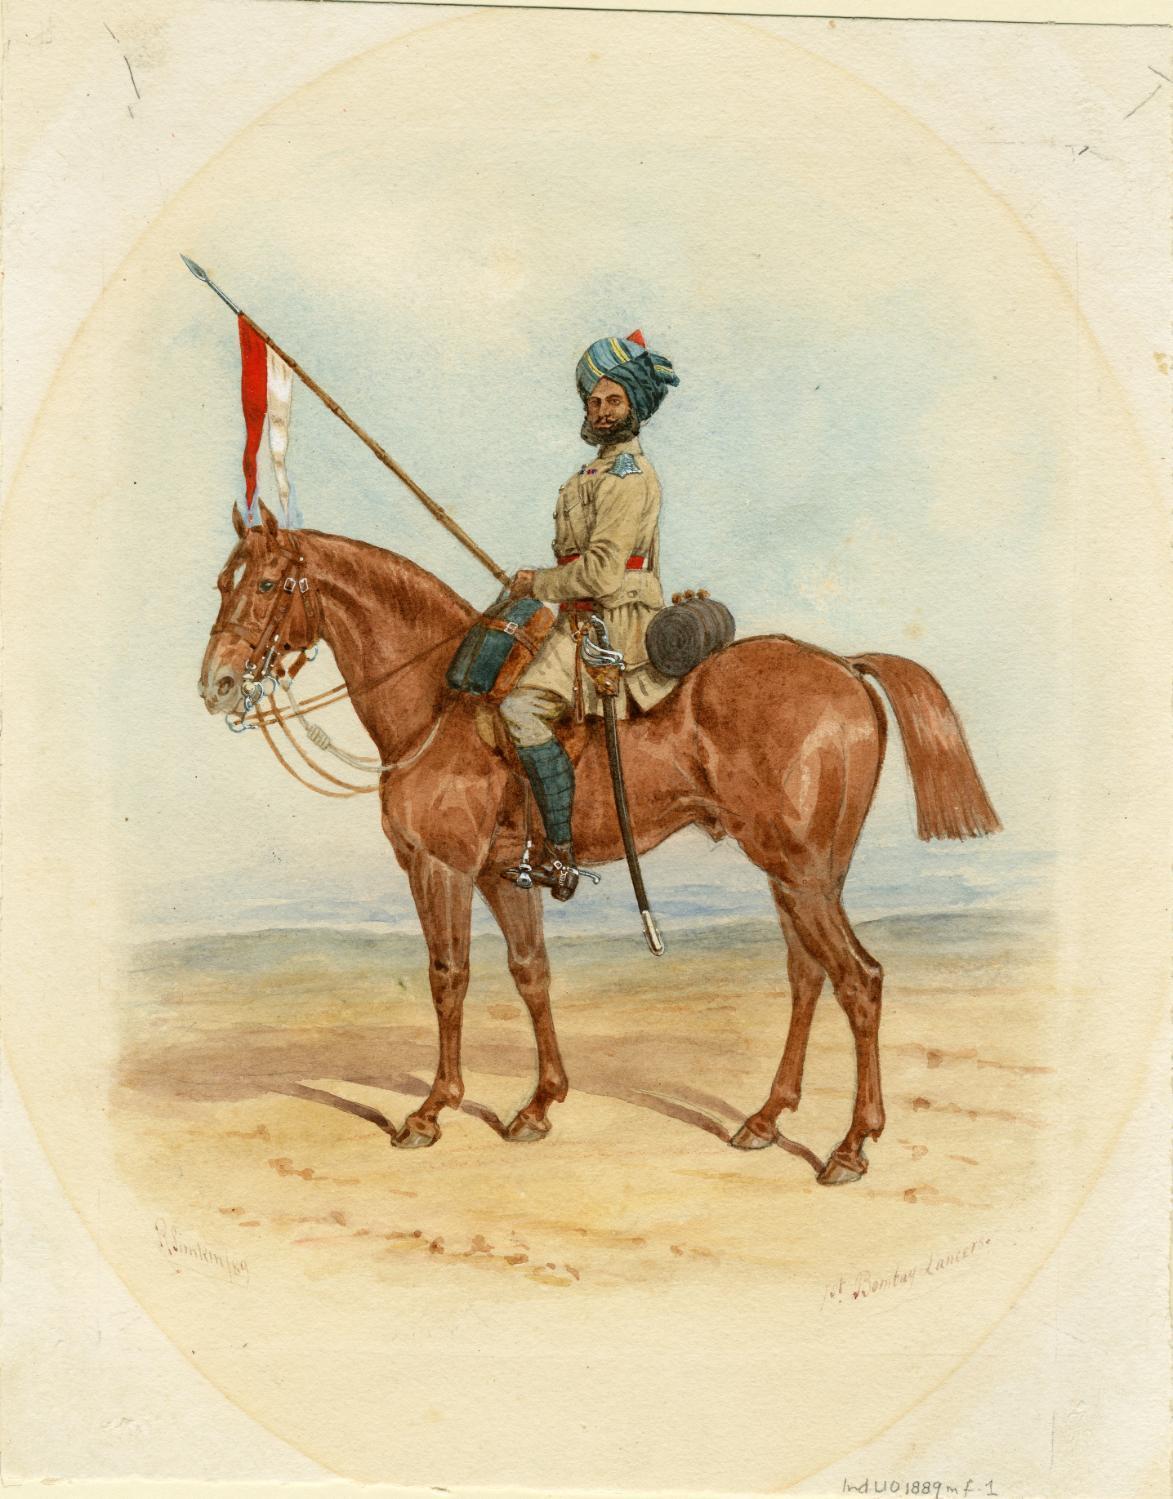 Bombay Lancer Jodhpurs